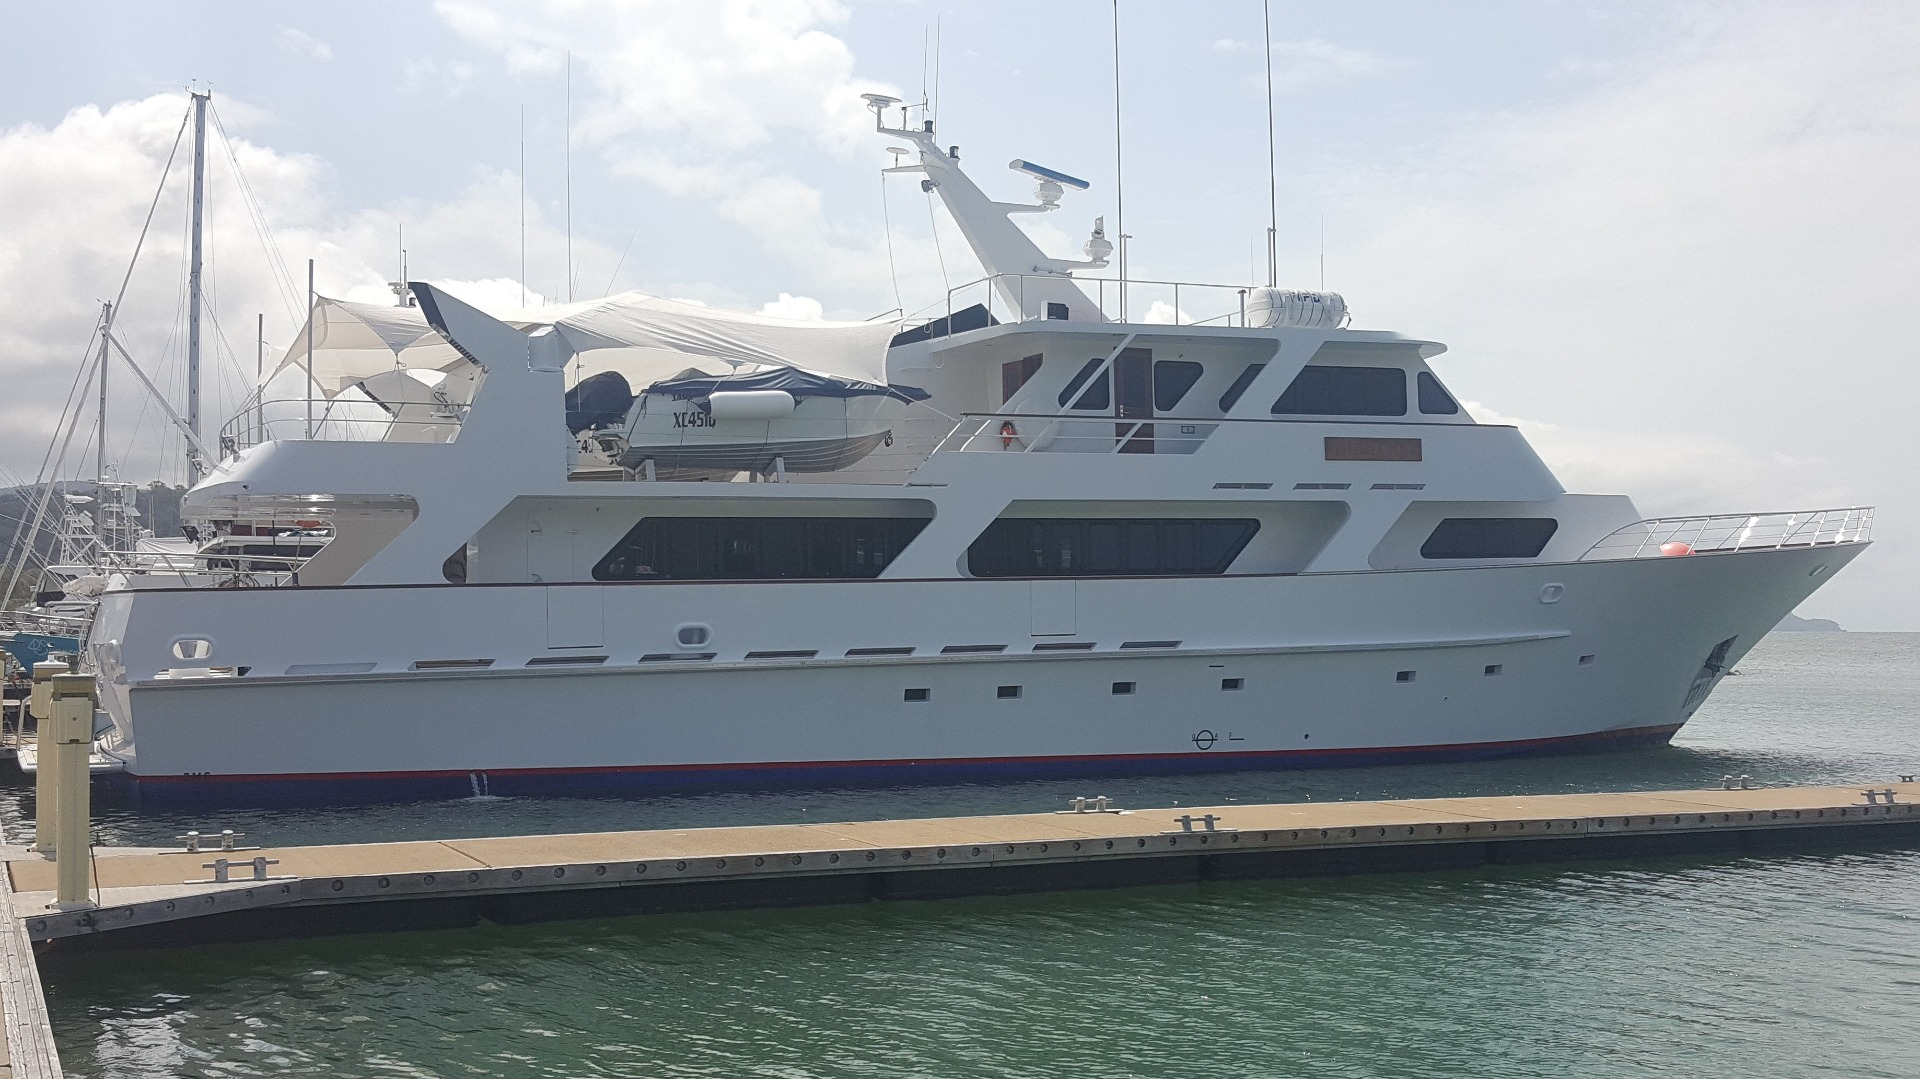 MV Mustique_Motor mount swap out